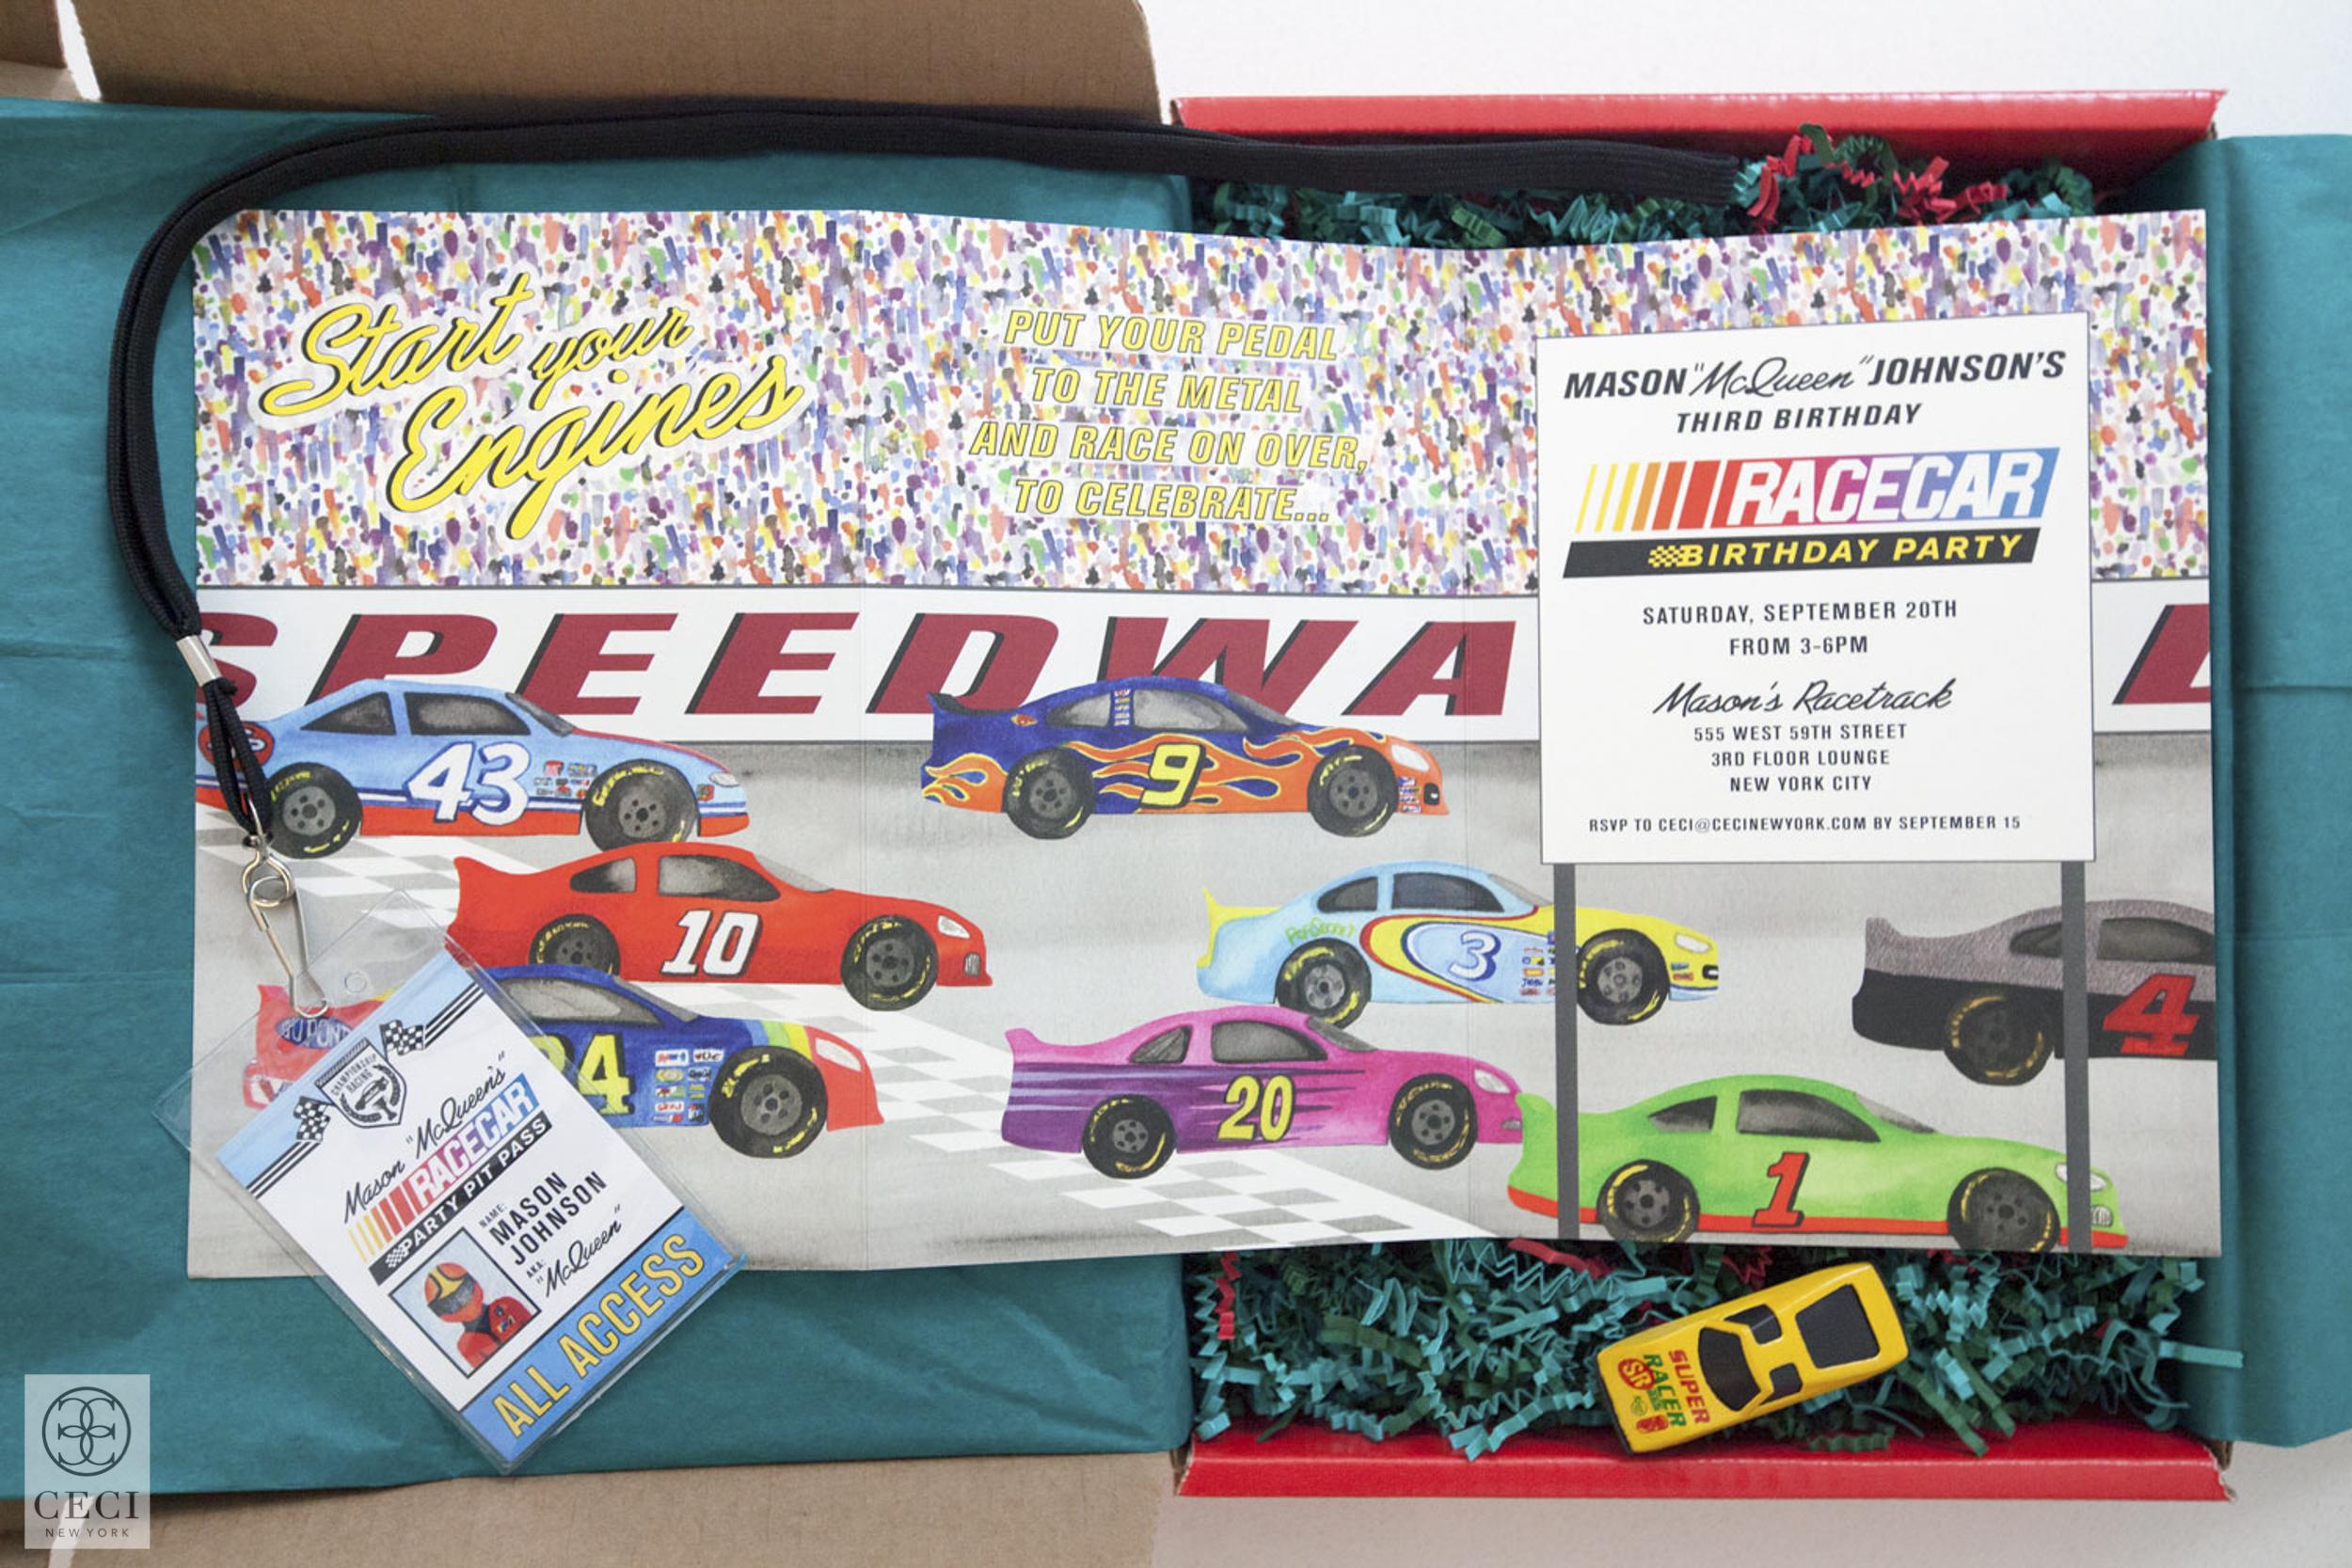 ceci_new_york_mason_ceci_johnson_race_car_birthday_party-24.jpg